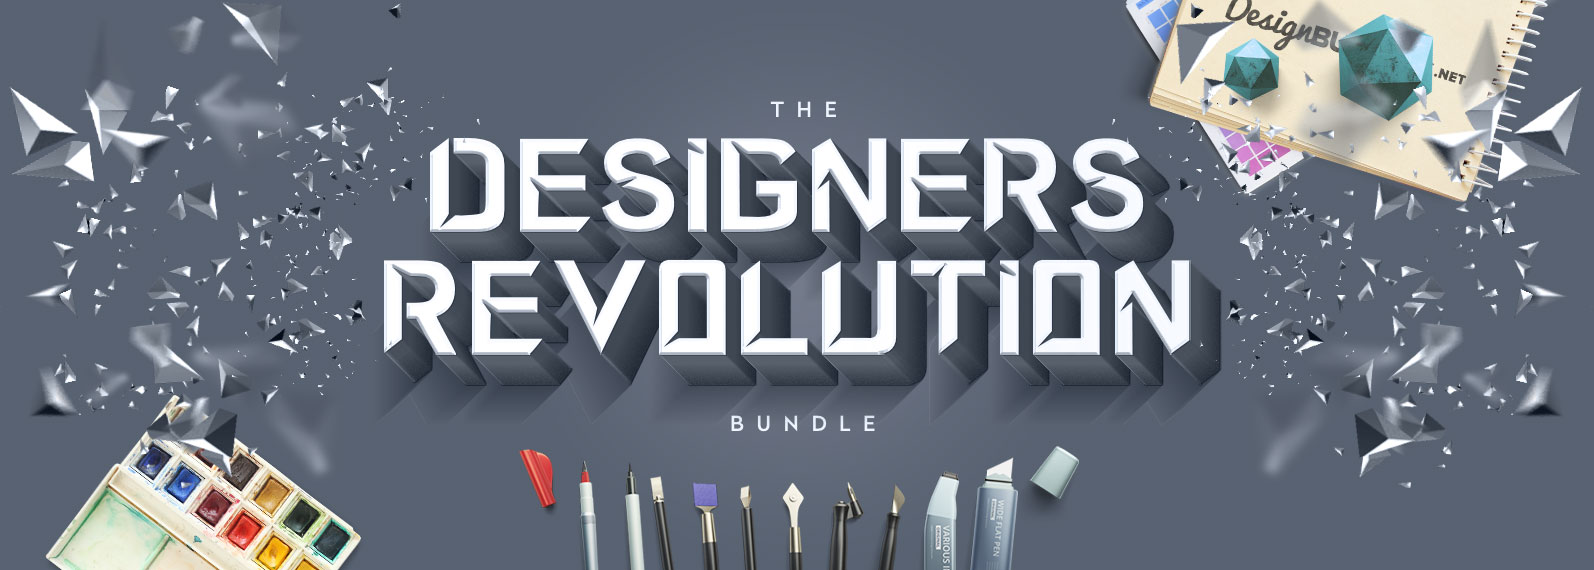 Designers Revolution Bundle Cover